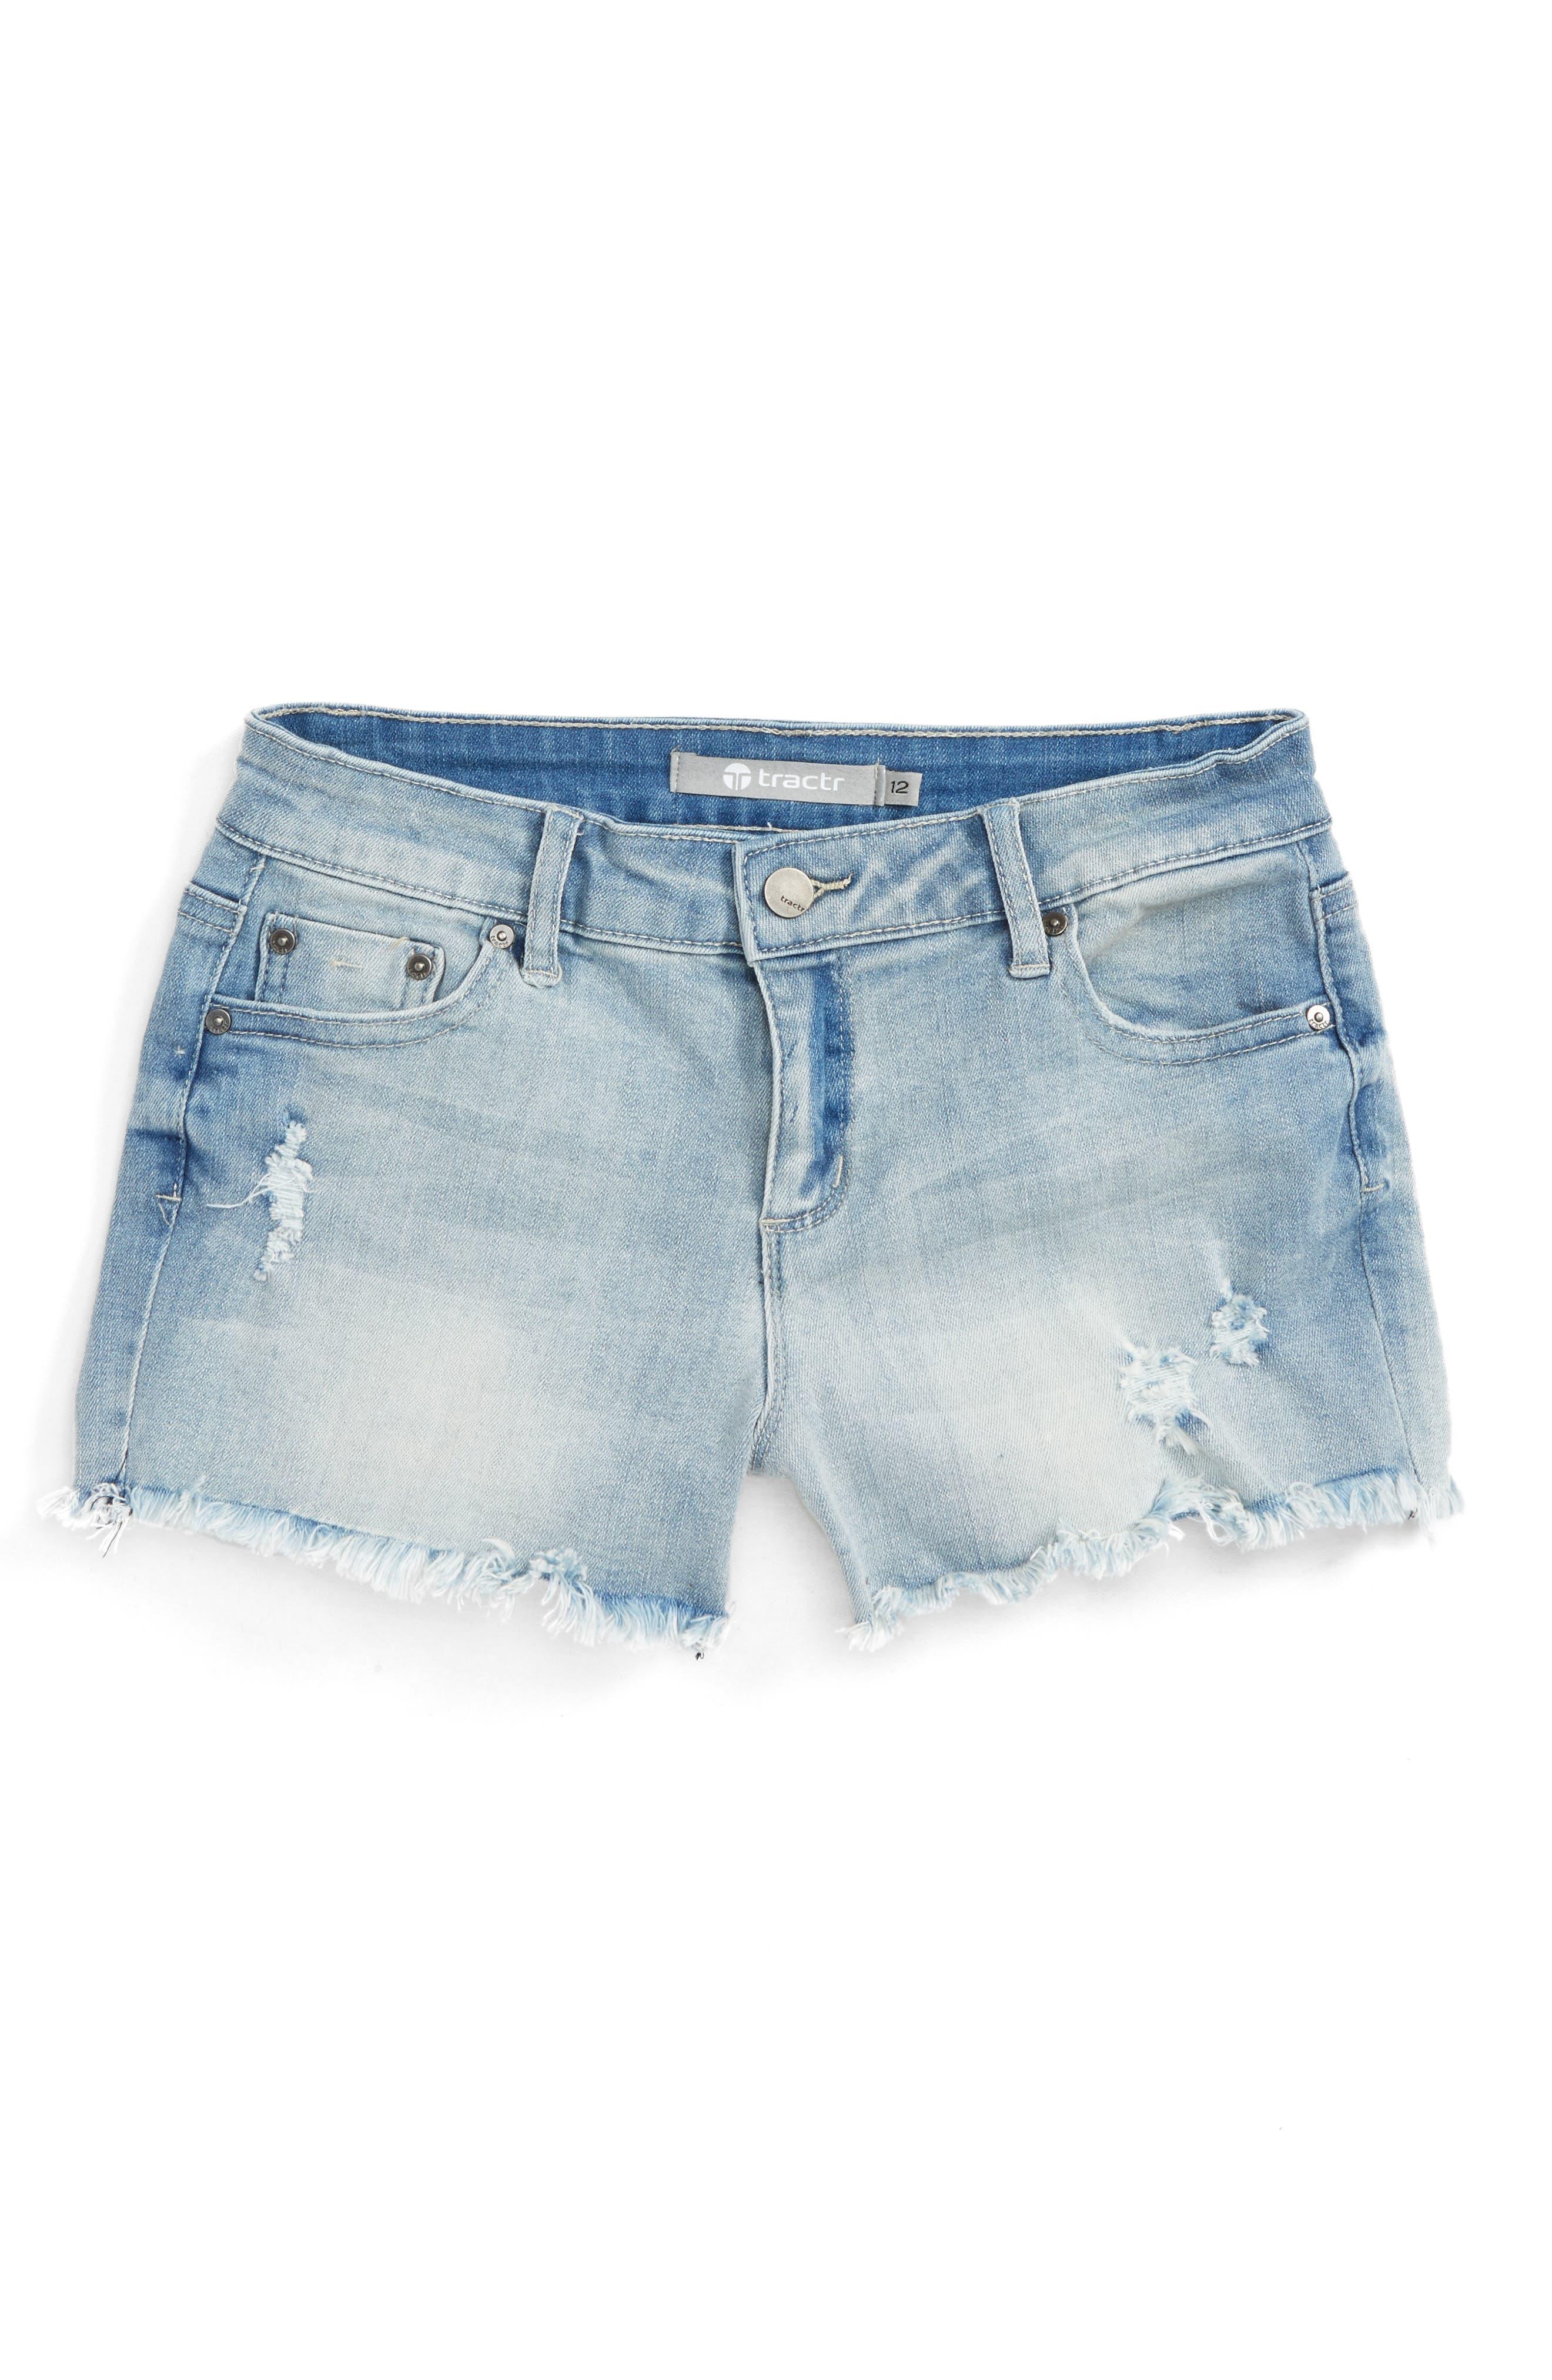 Tractr Distressed Cutoff Denim Shorts (Big Girls)